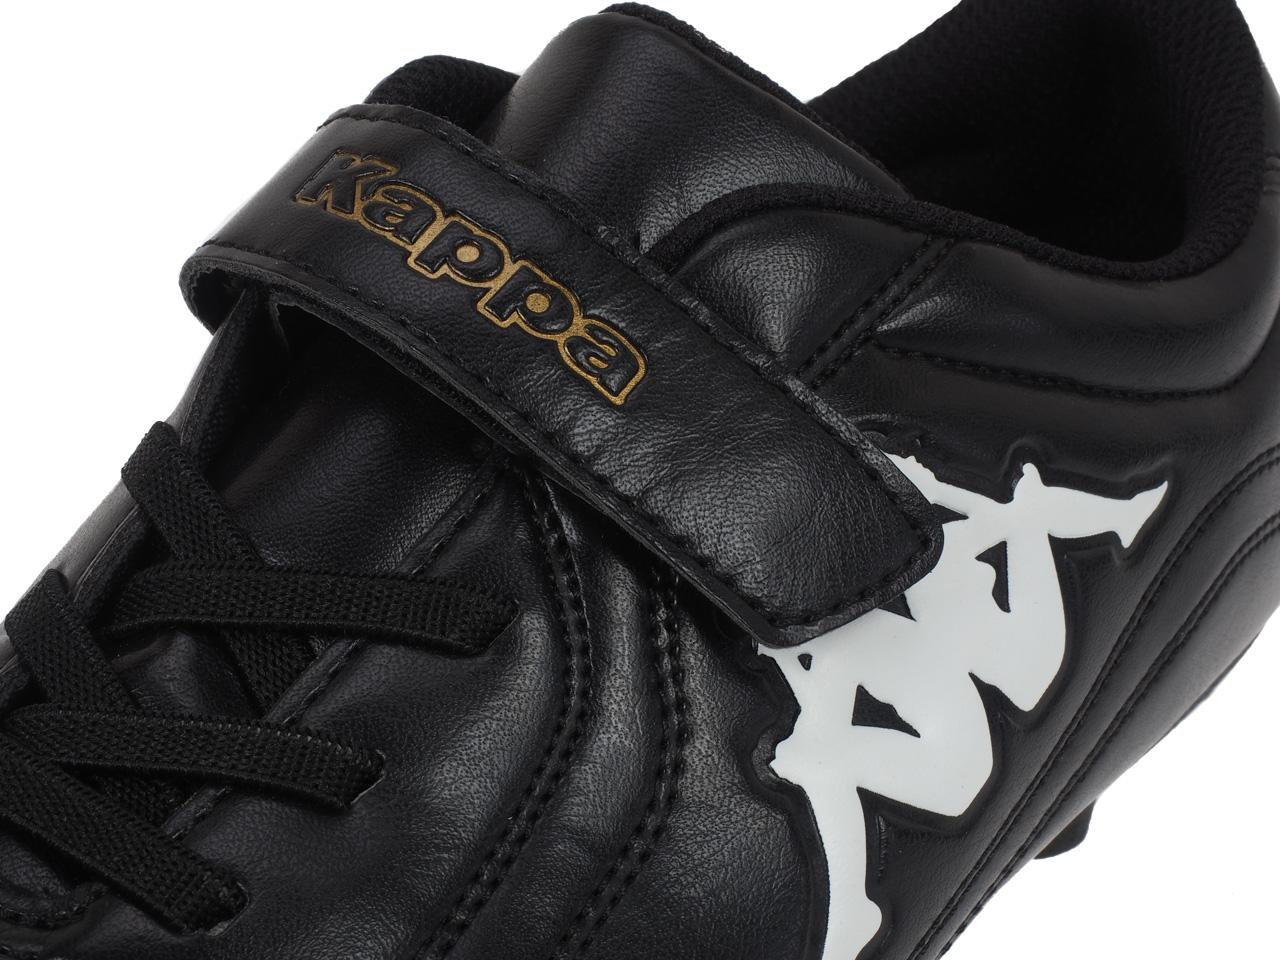 Football-Shoes-Molded-Kappa-Parek-Fg-Kid-Black-Black-75087-New thumbnail 2